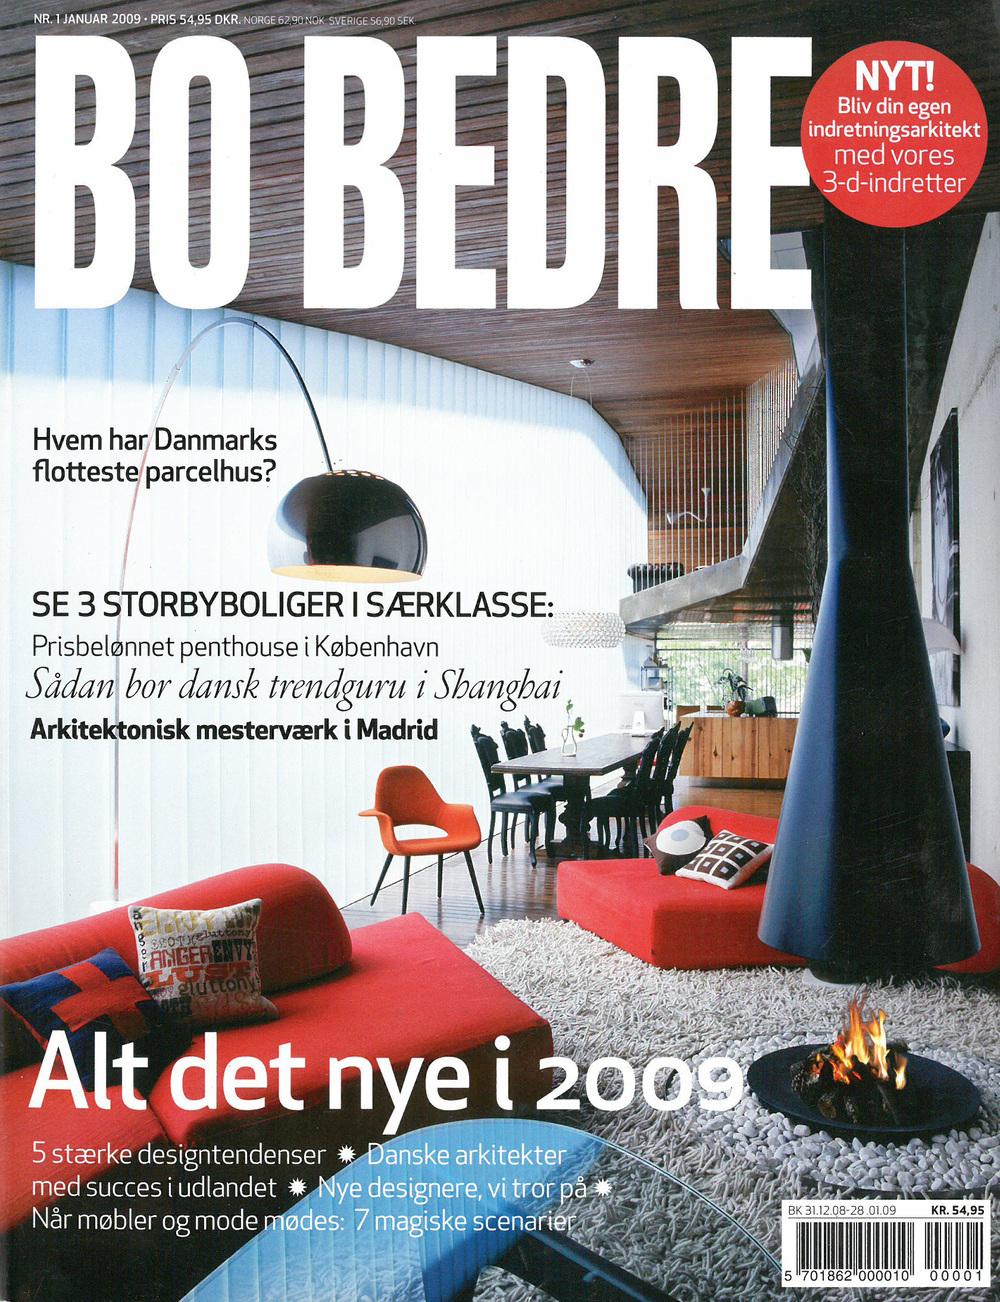 BB_1_cover.jpg